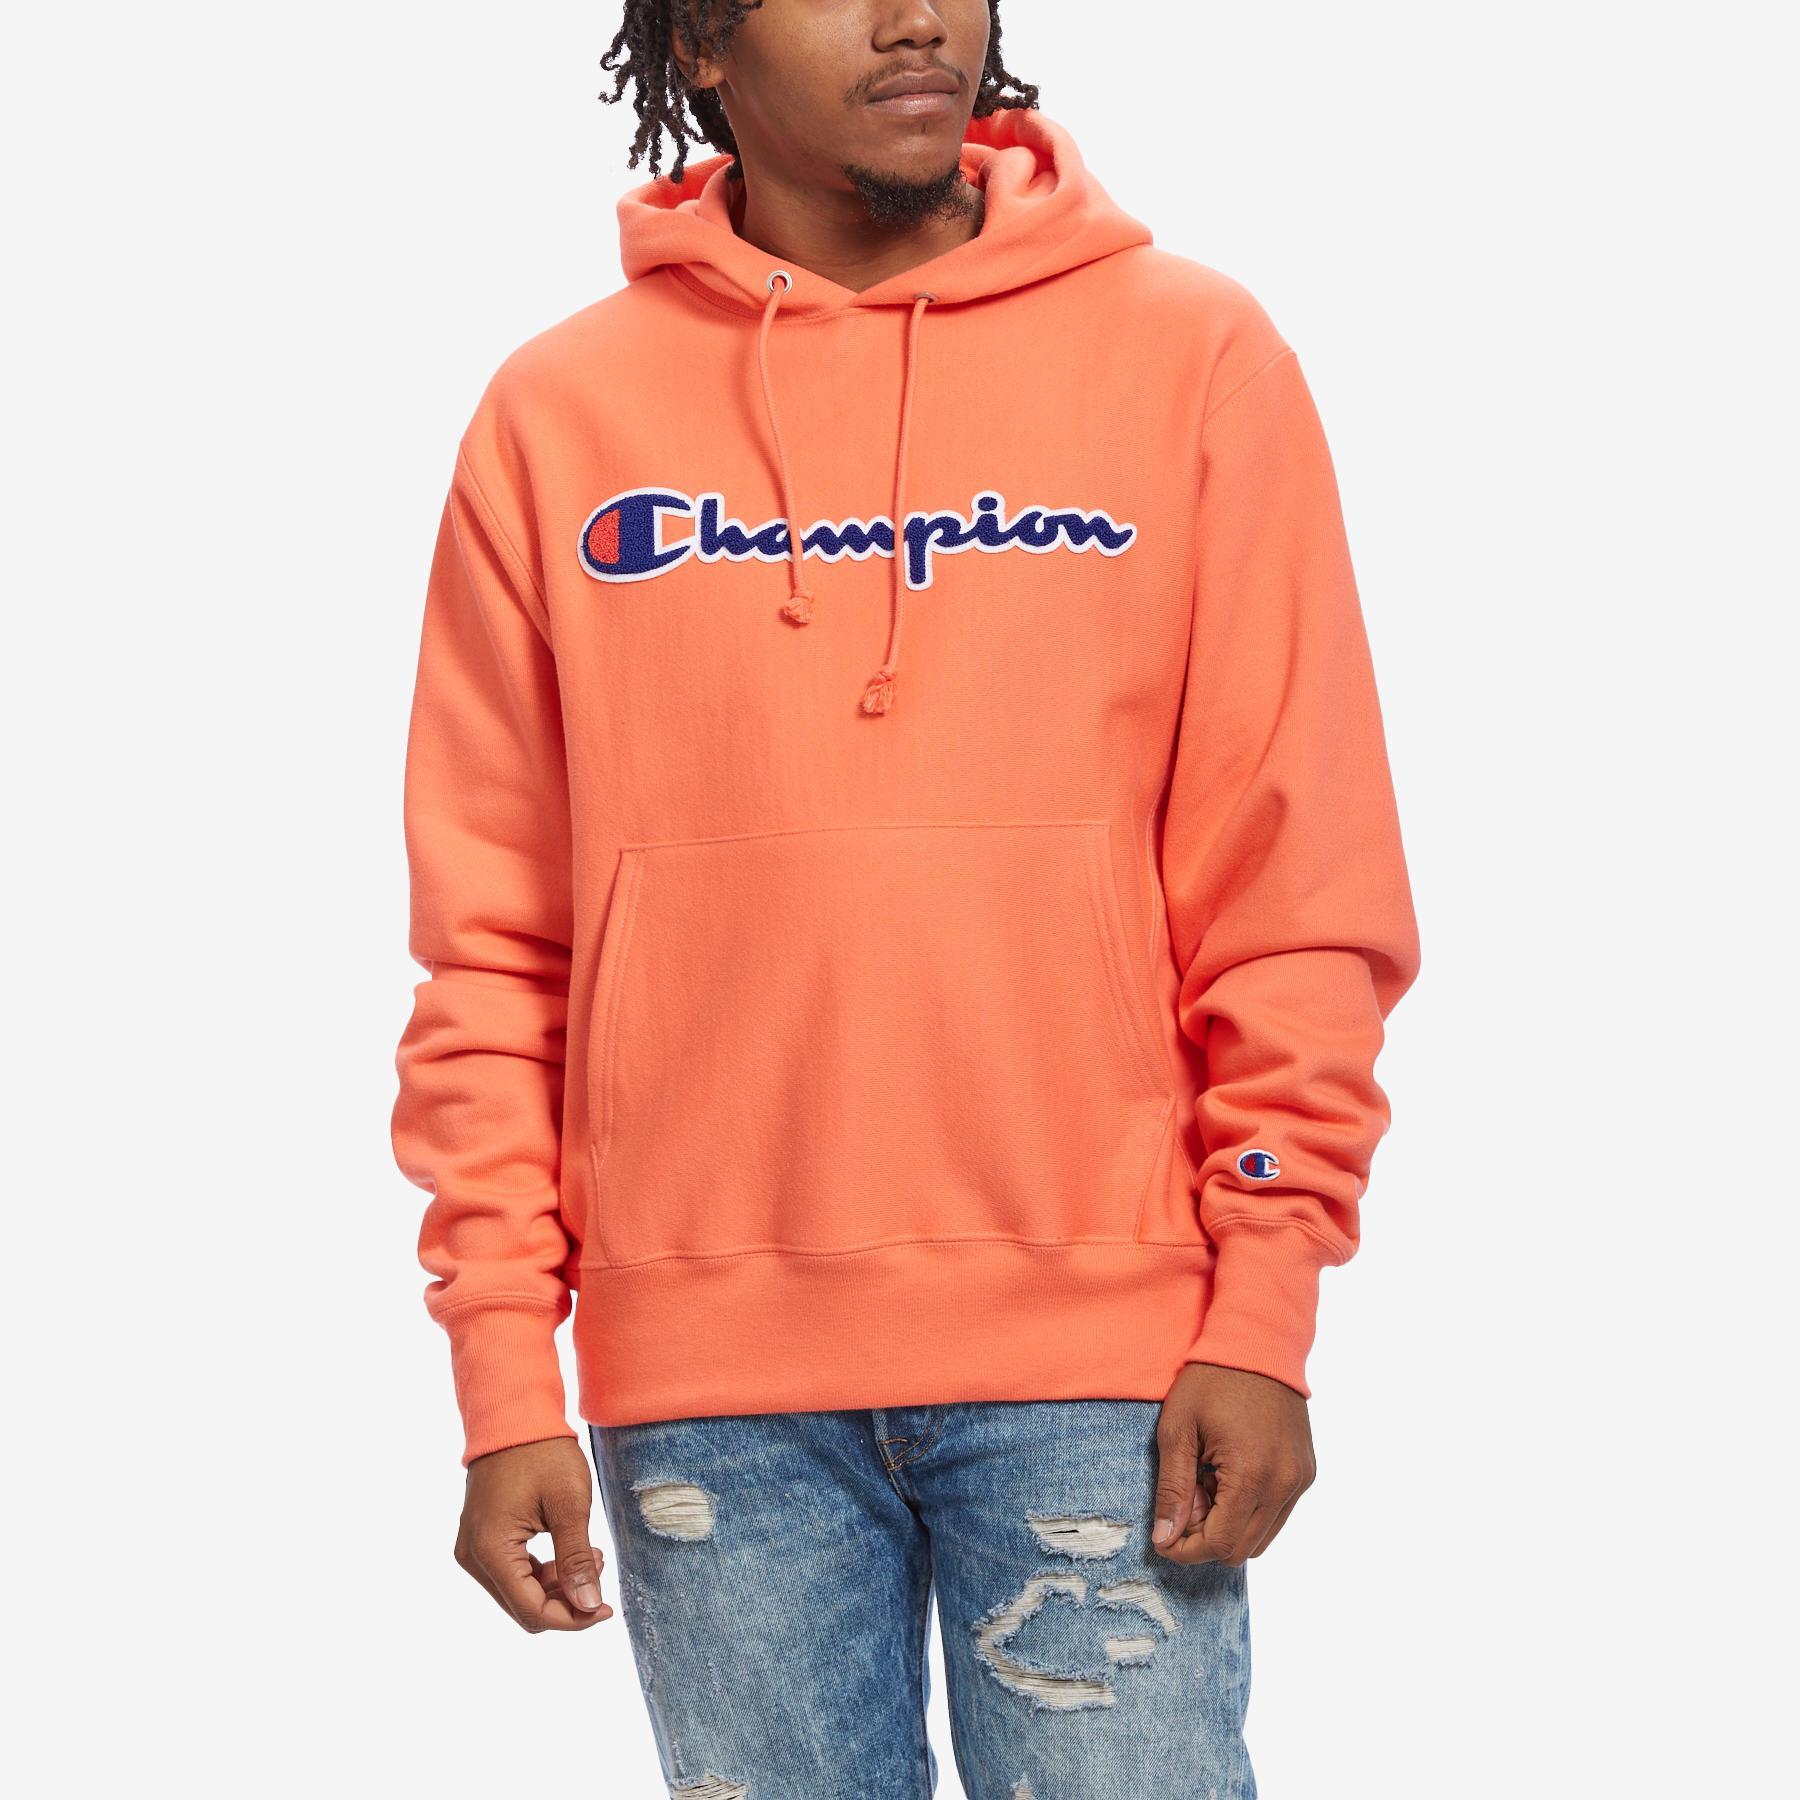 Men's Life Reverse Weave Chenille Logo Pullover Hoodie